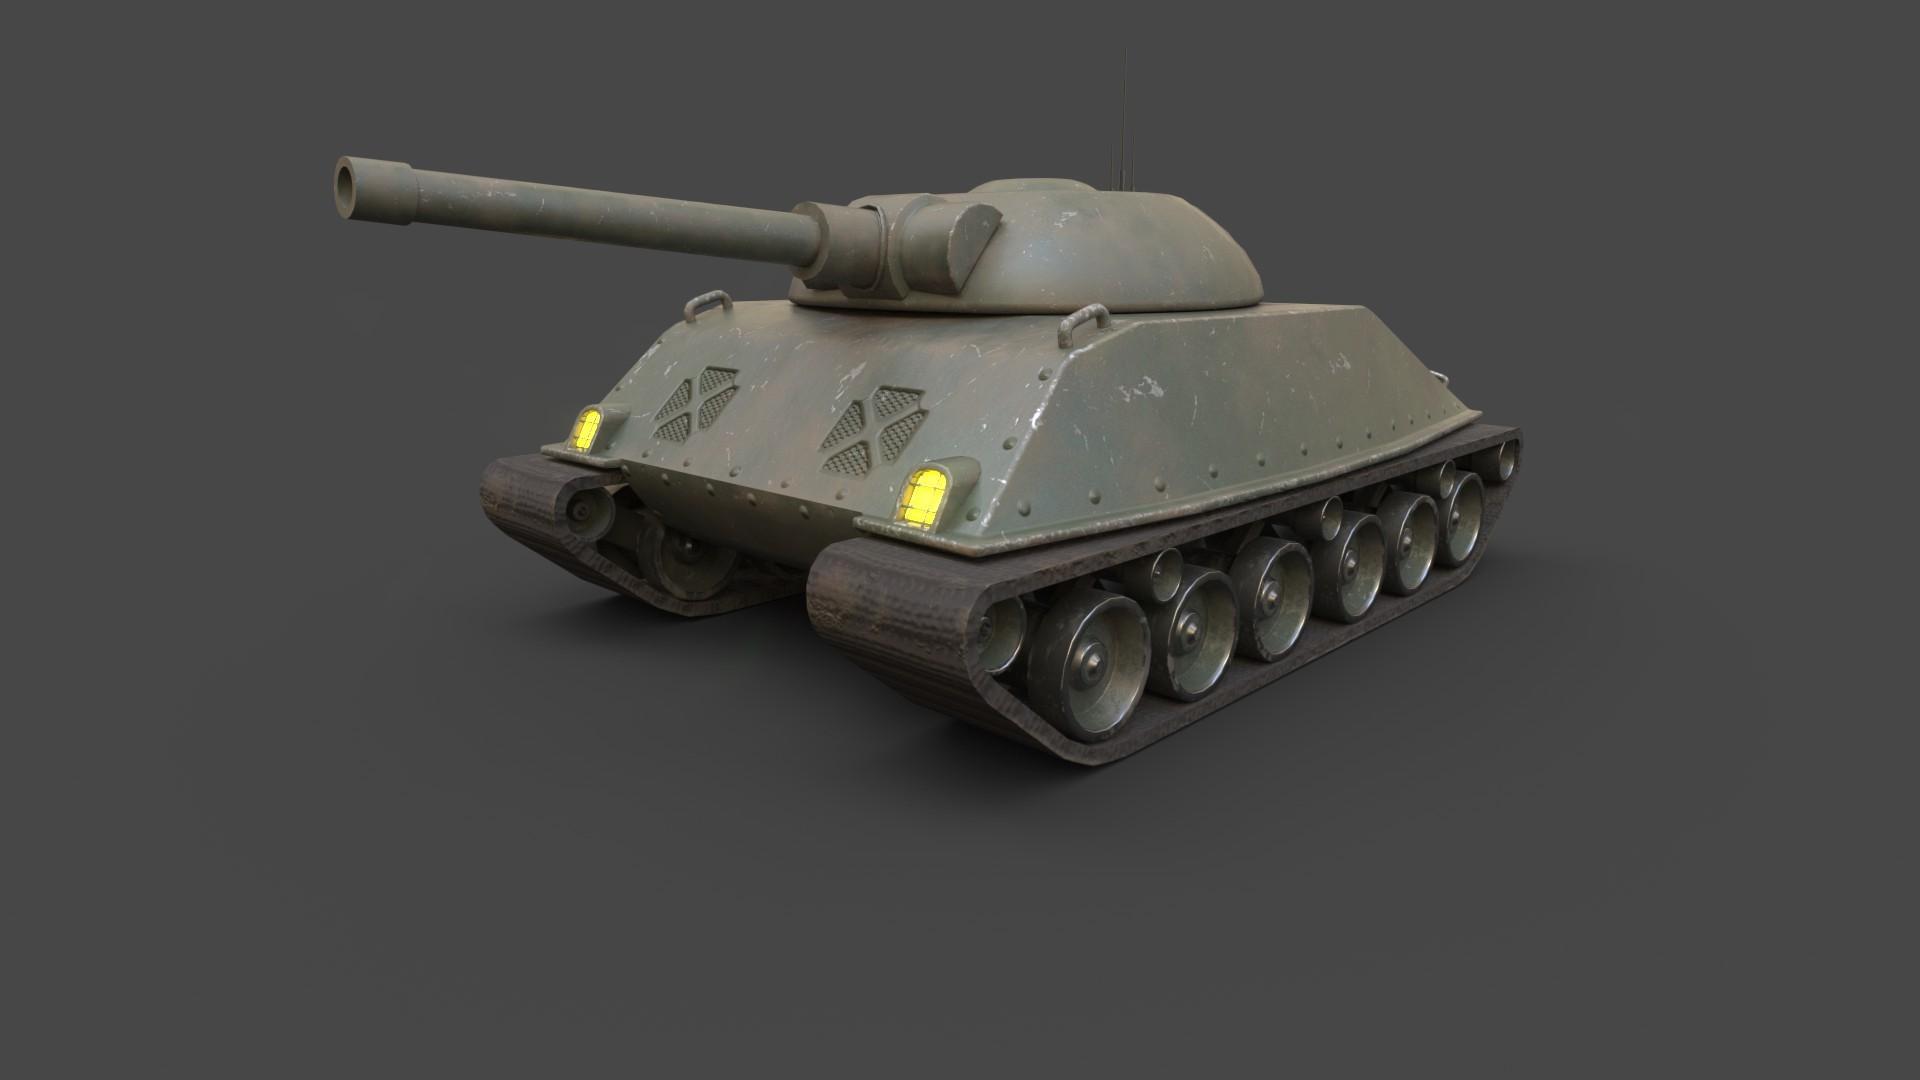 Alican Sayan Low Poly Cartoony Sherman Tank